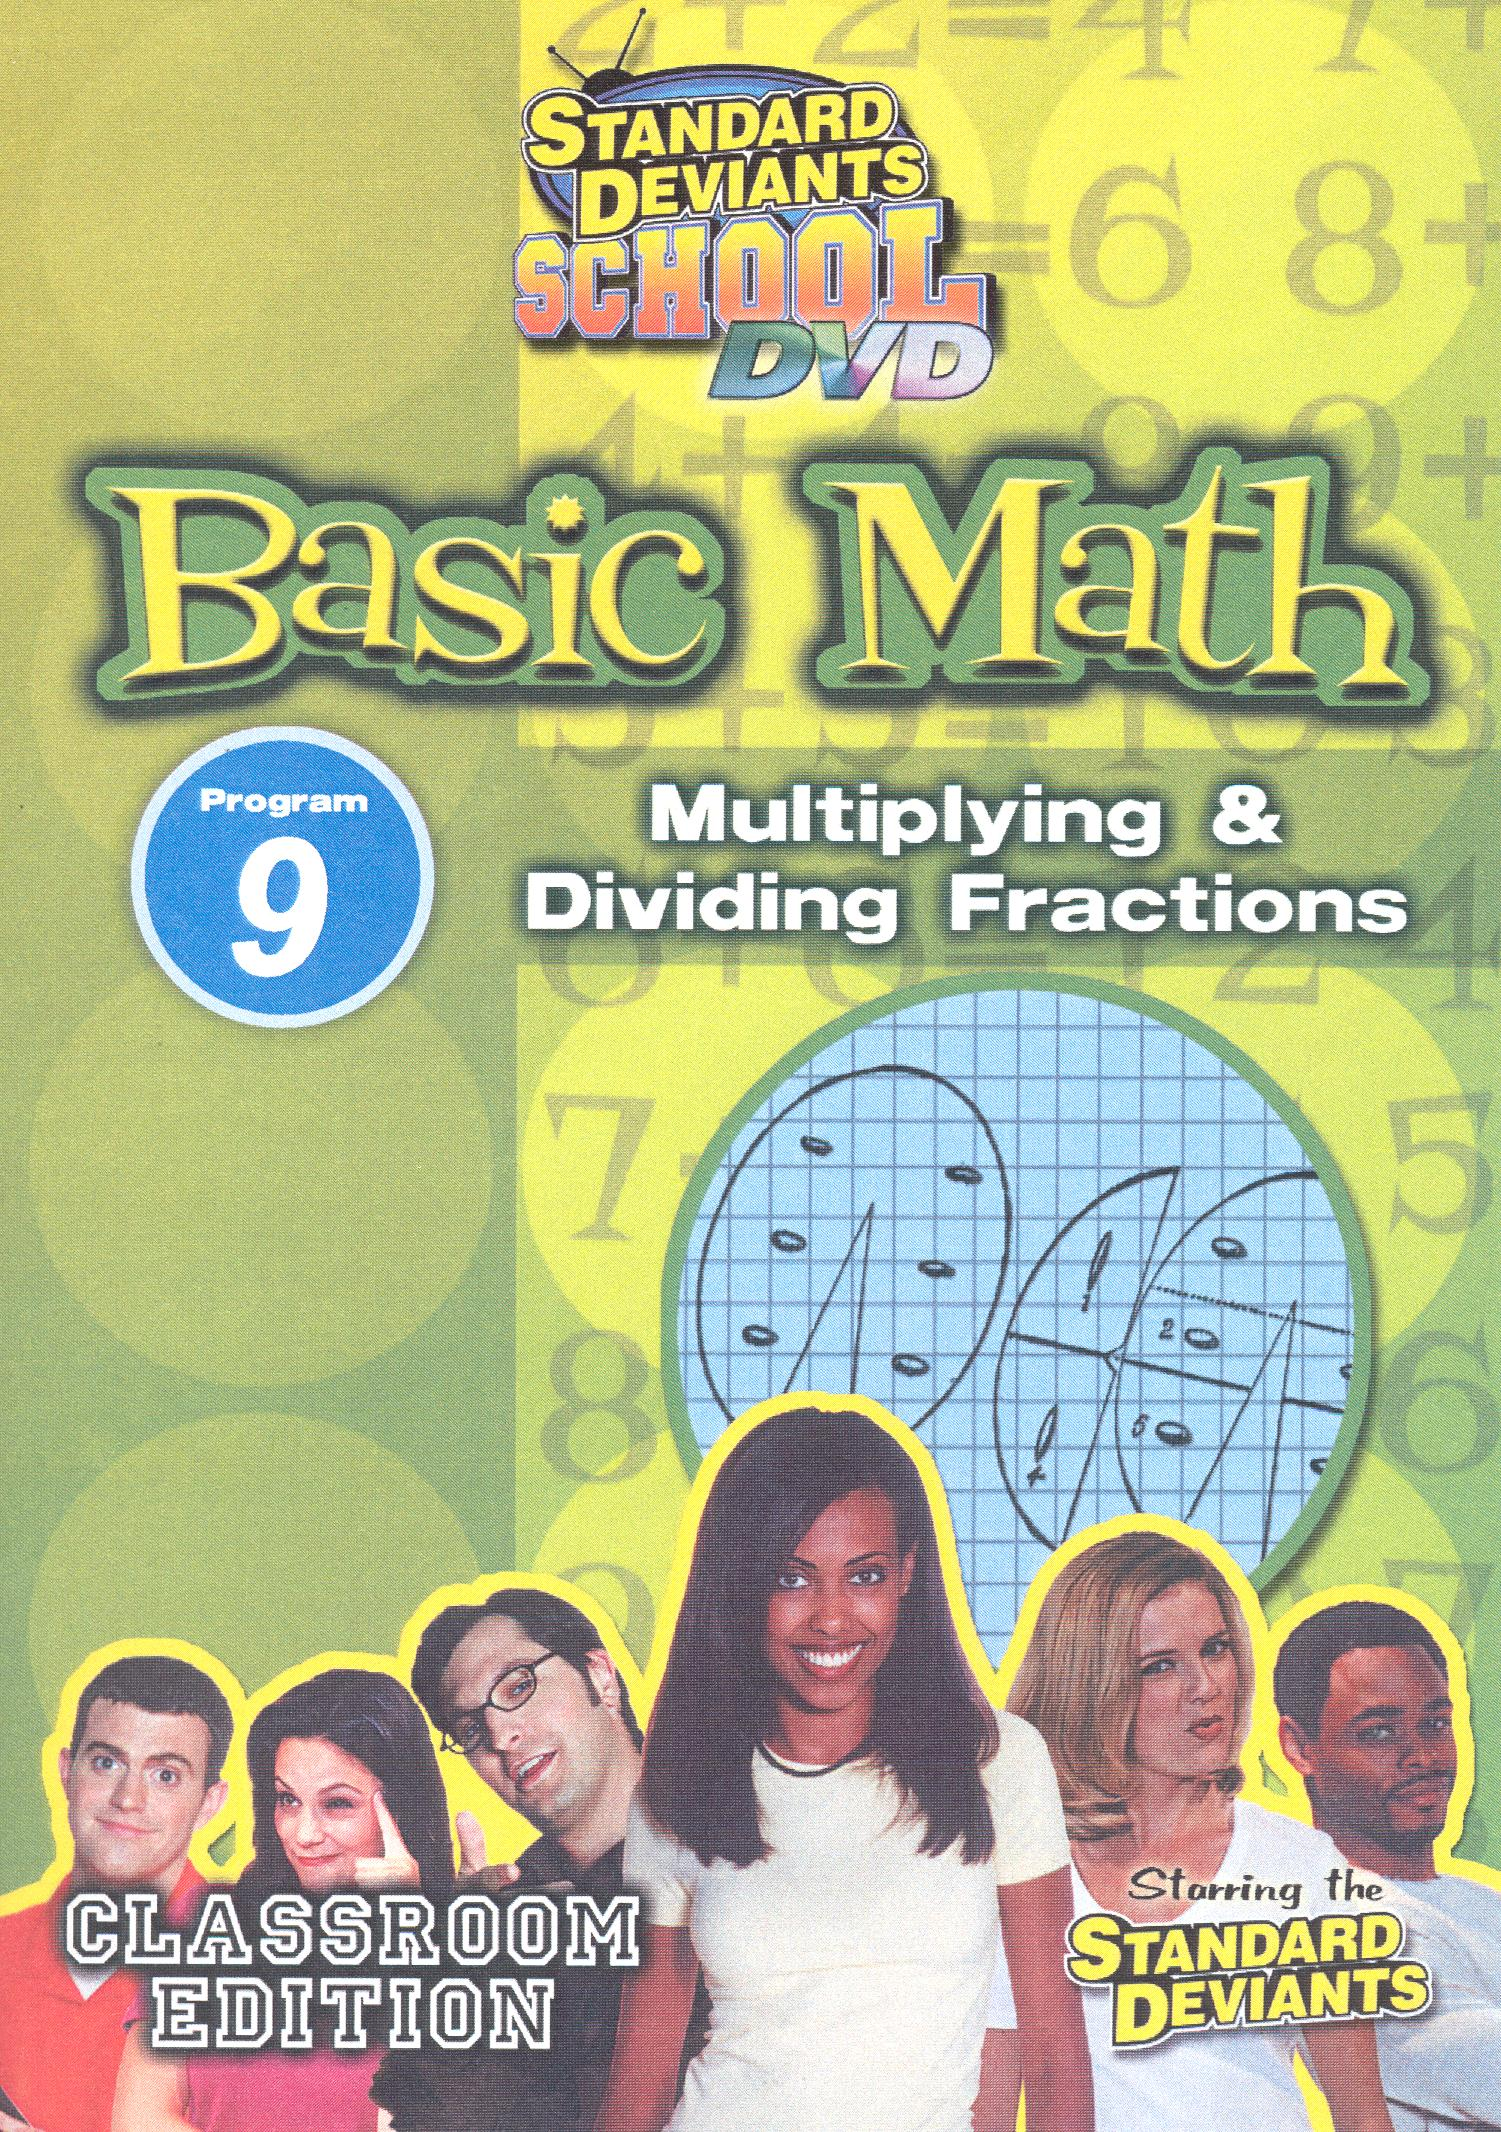 Standard Deviants School: Basic Math, Program 9